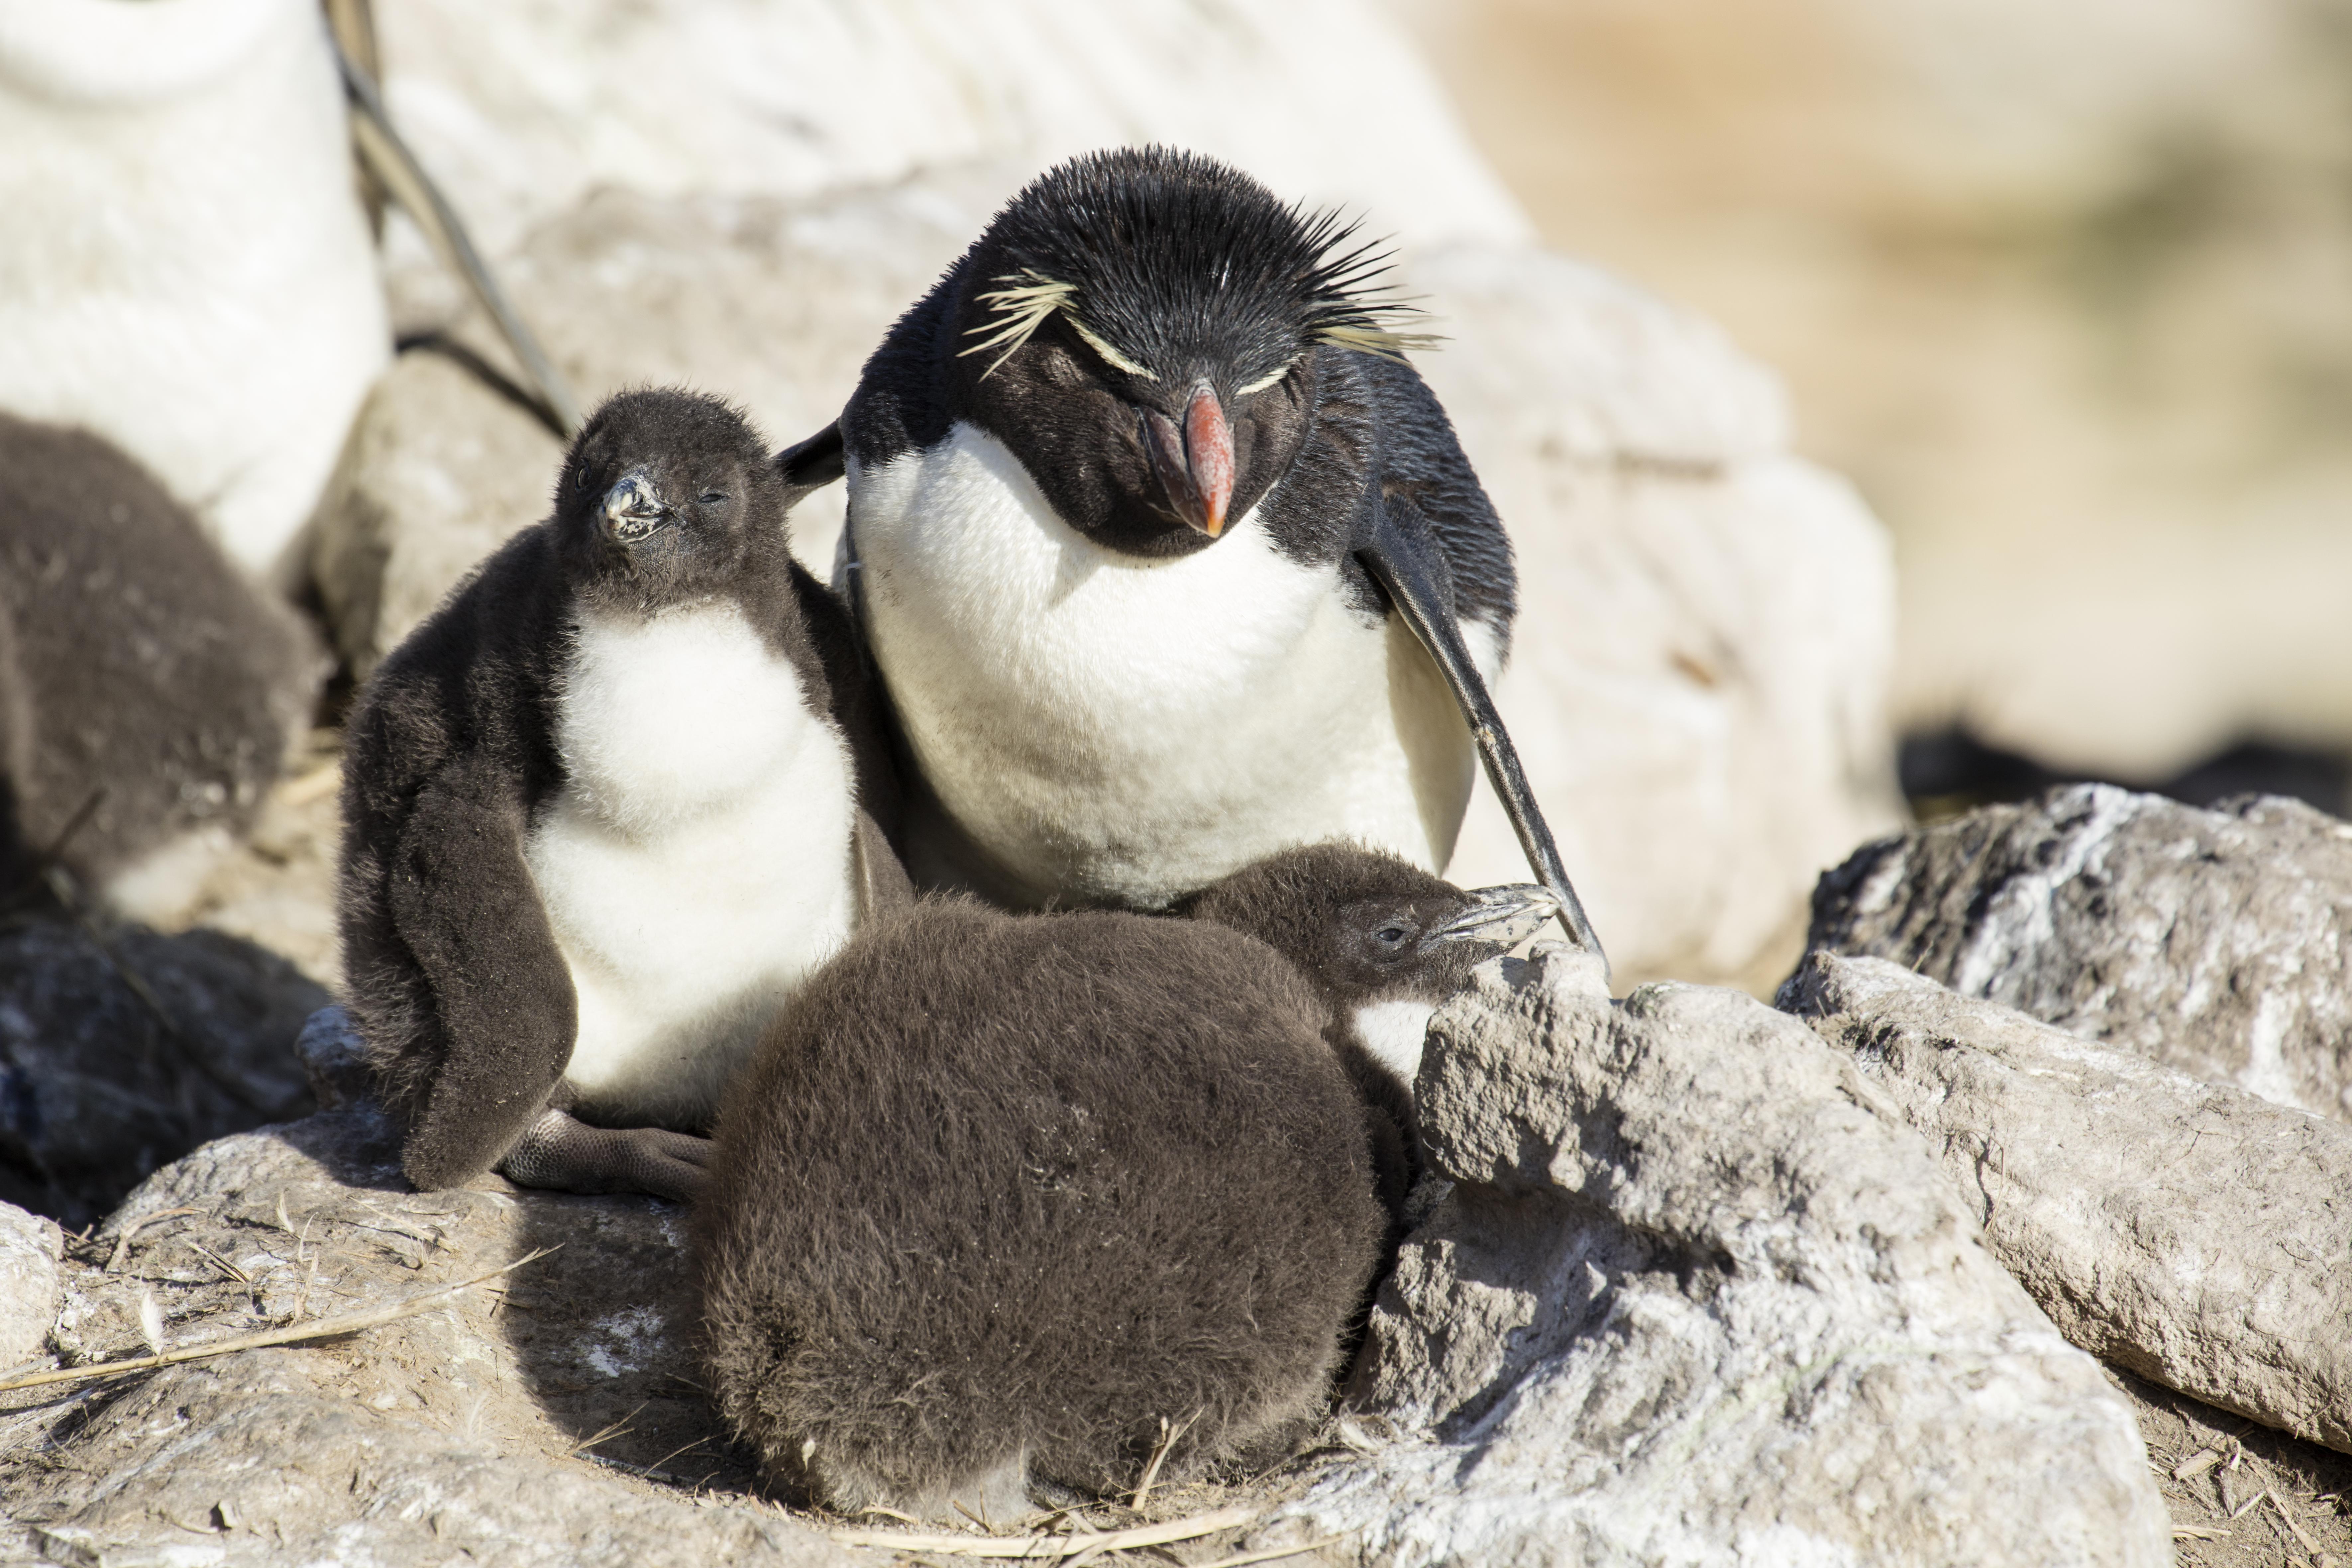 Rockhopper penguins on New Island in the Falkland Islands. Photo taken on January 5, 2016.